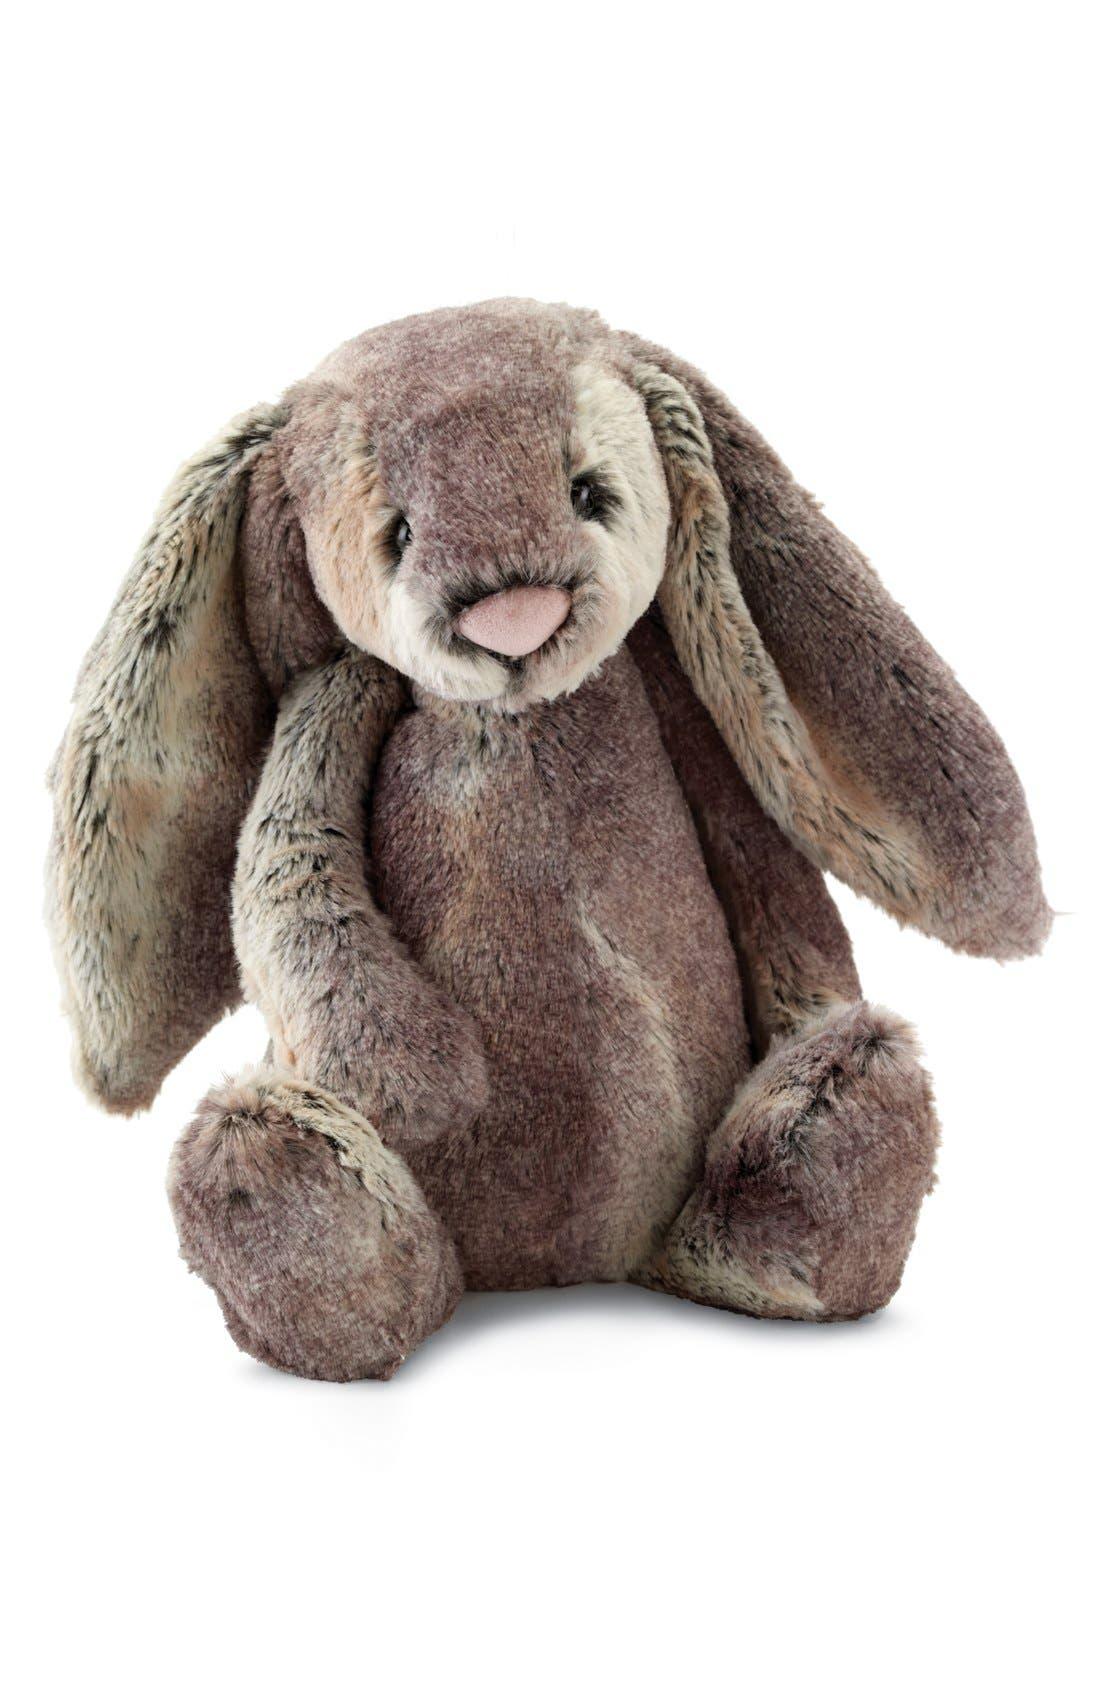 Main Image - Jellycat Woodland Babe Bunny Stuffed Animal